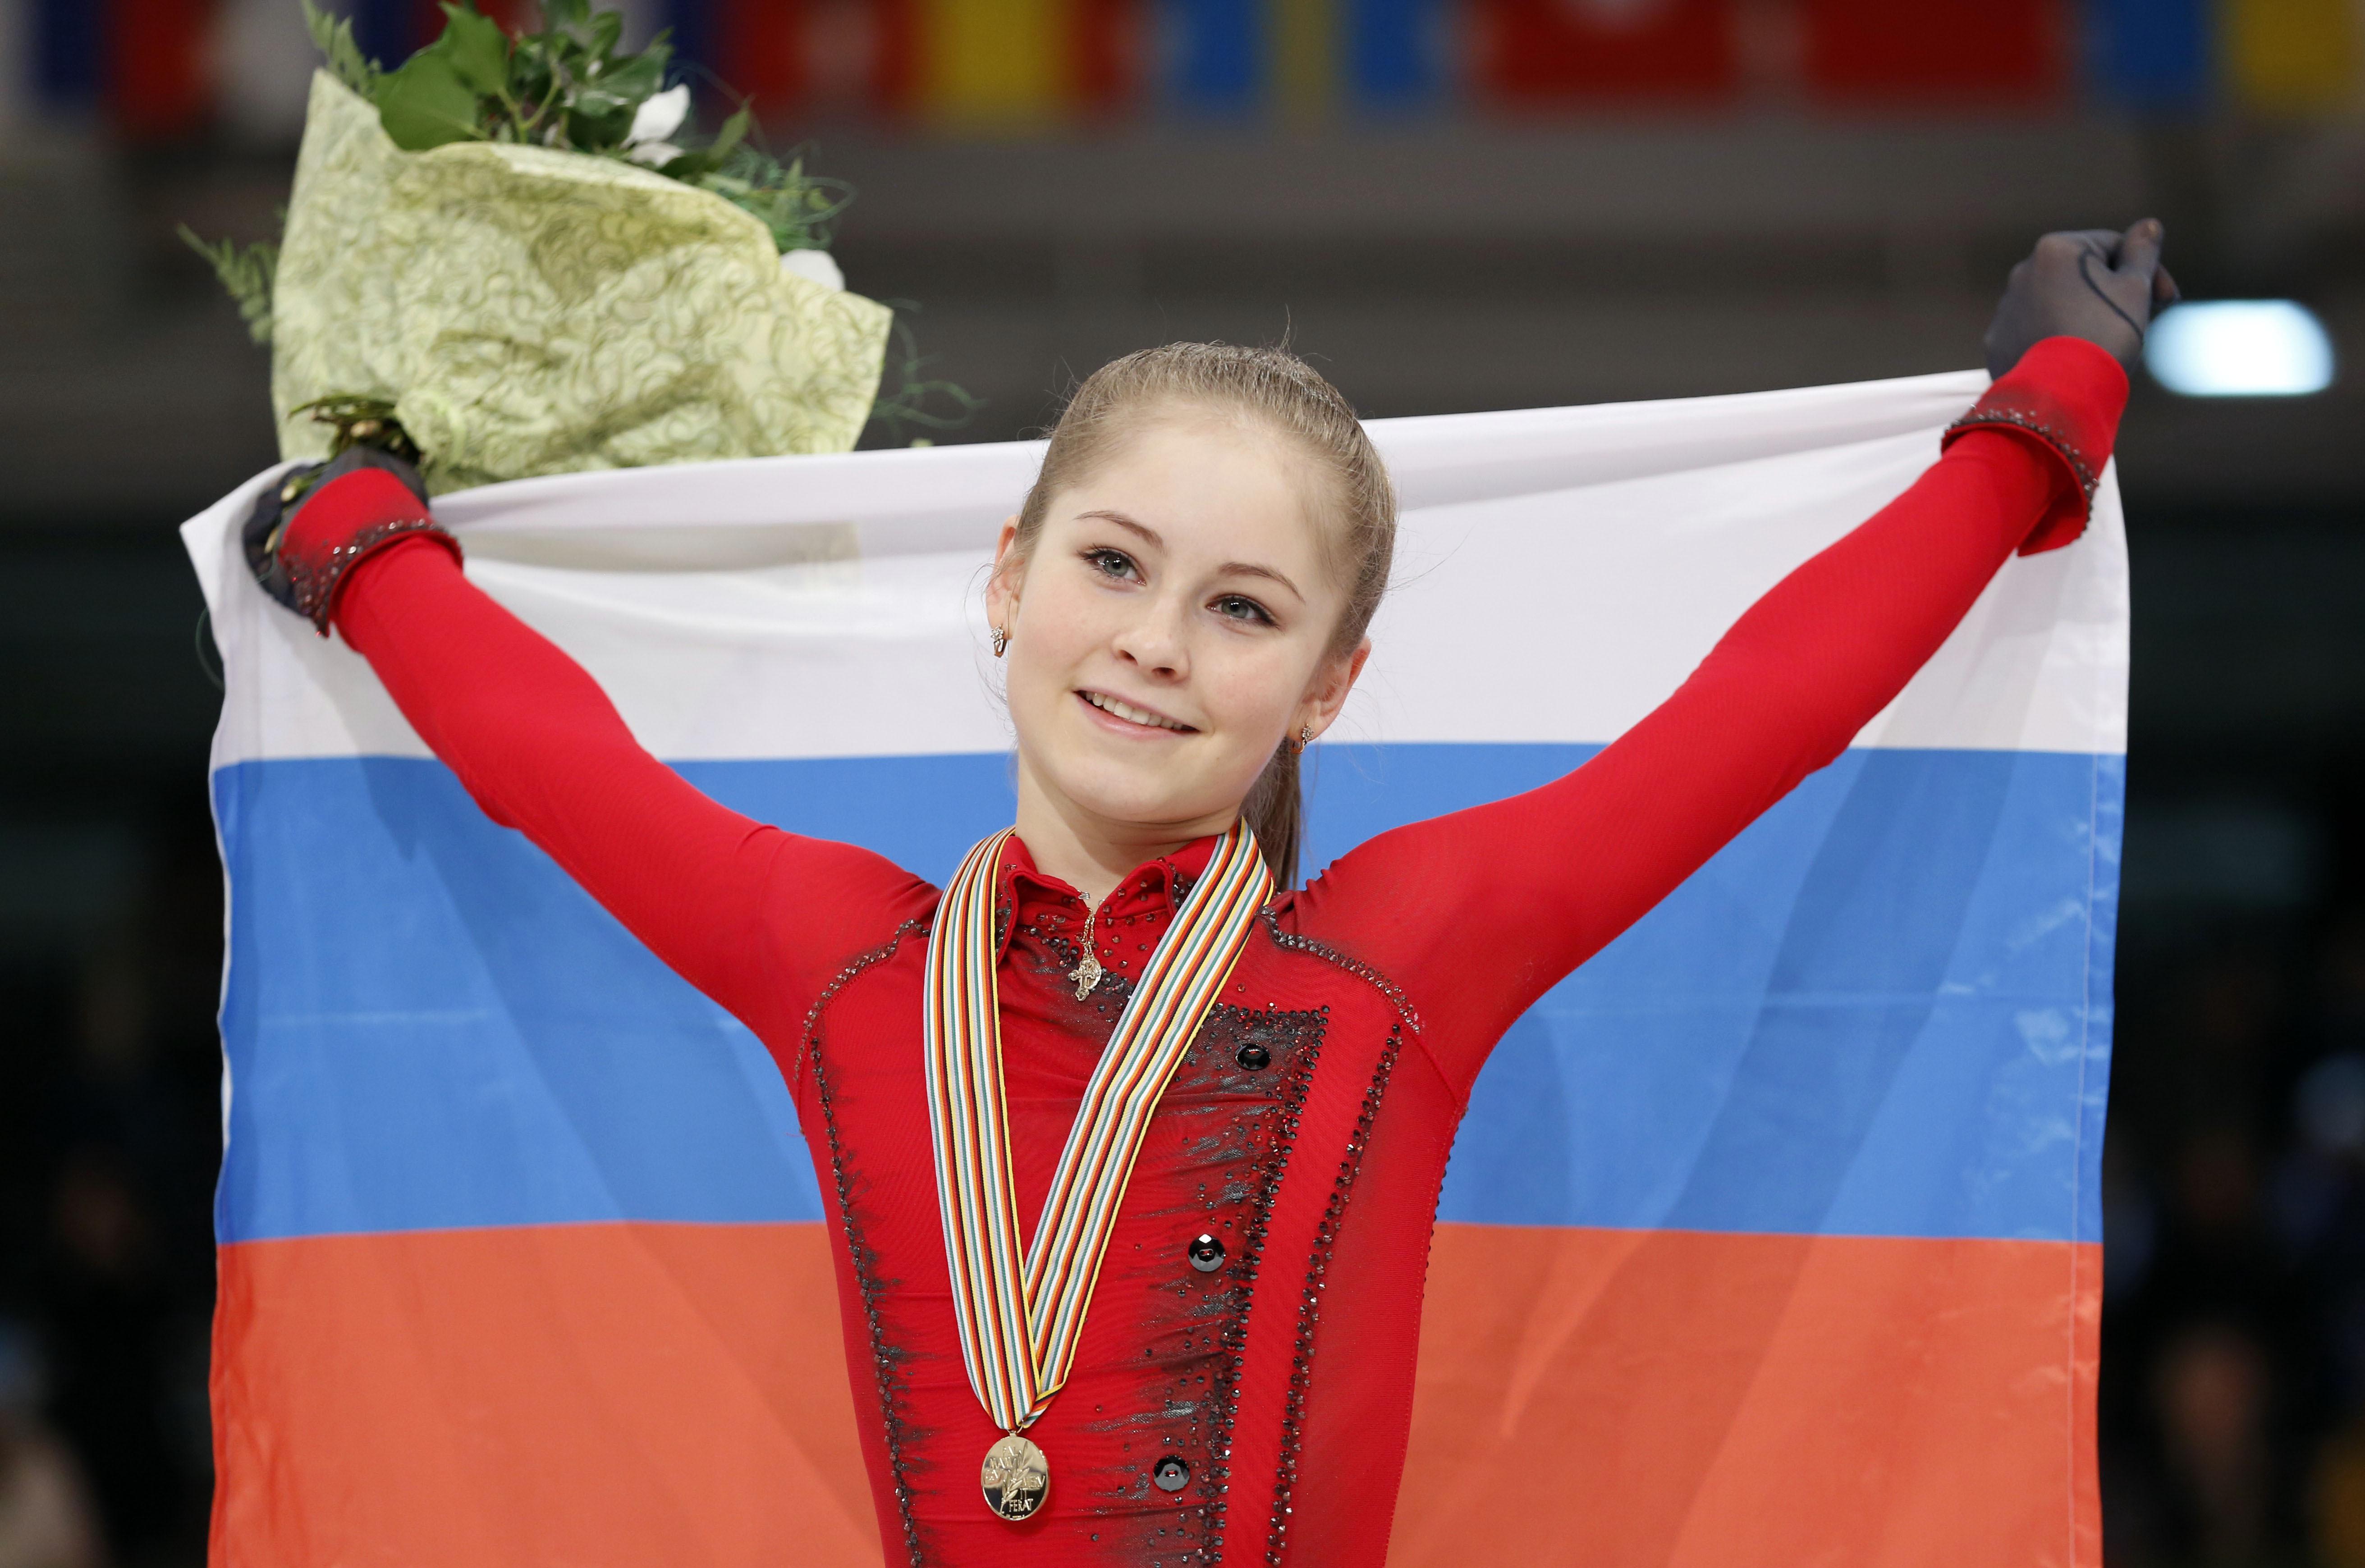 спортсменки девушки российские фото имена фамилии других мне